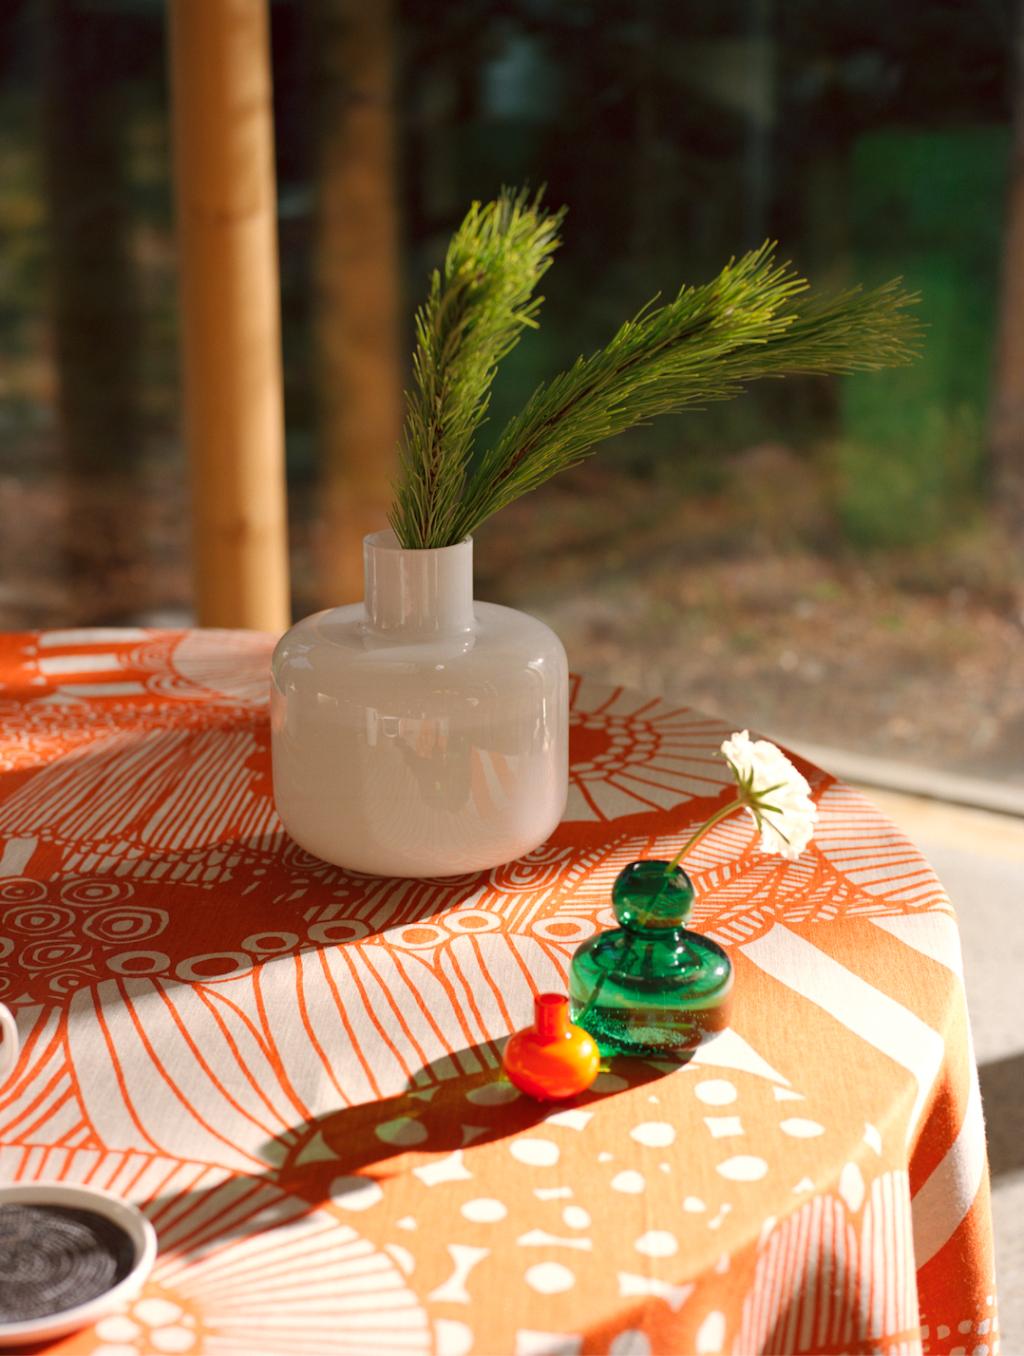 Marimekko Fall 2019 home for Marimekko by Susanna Vento